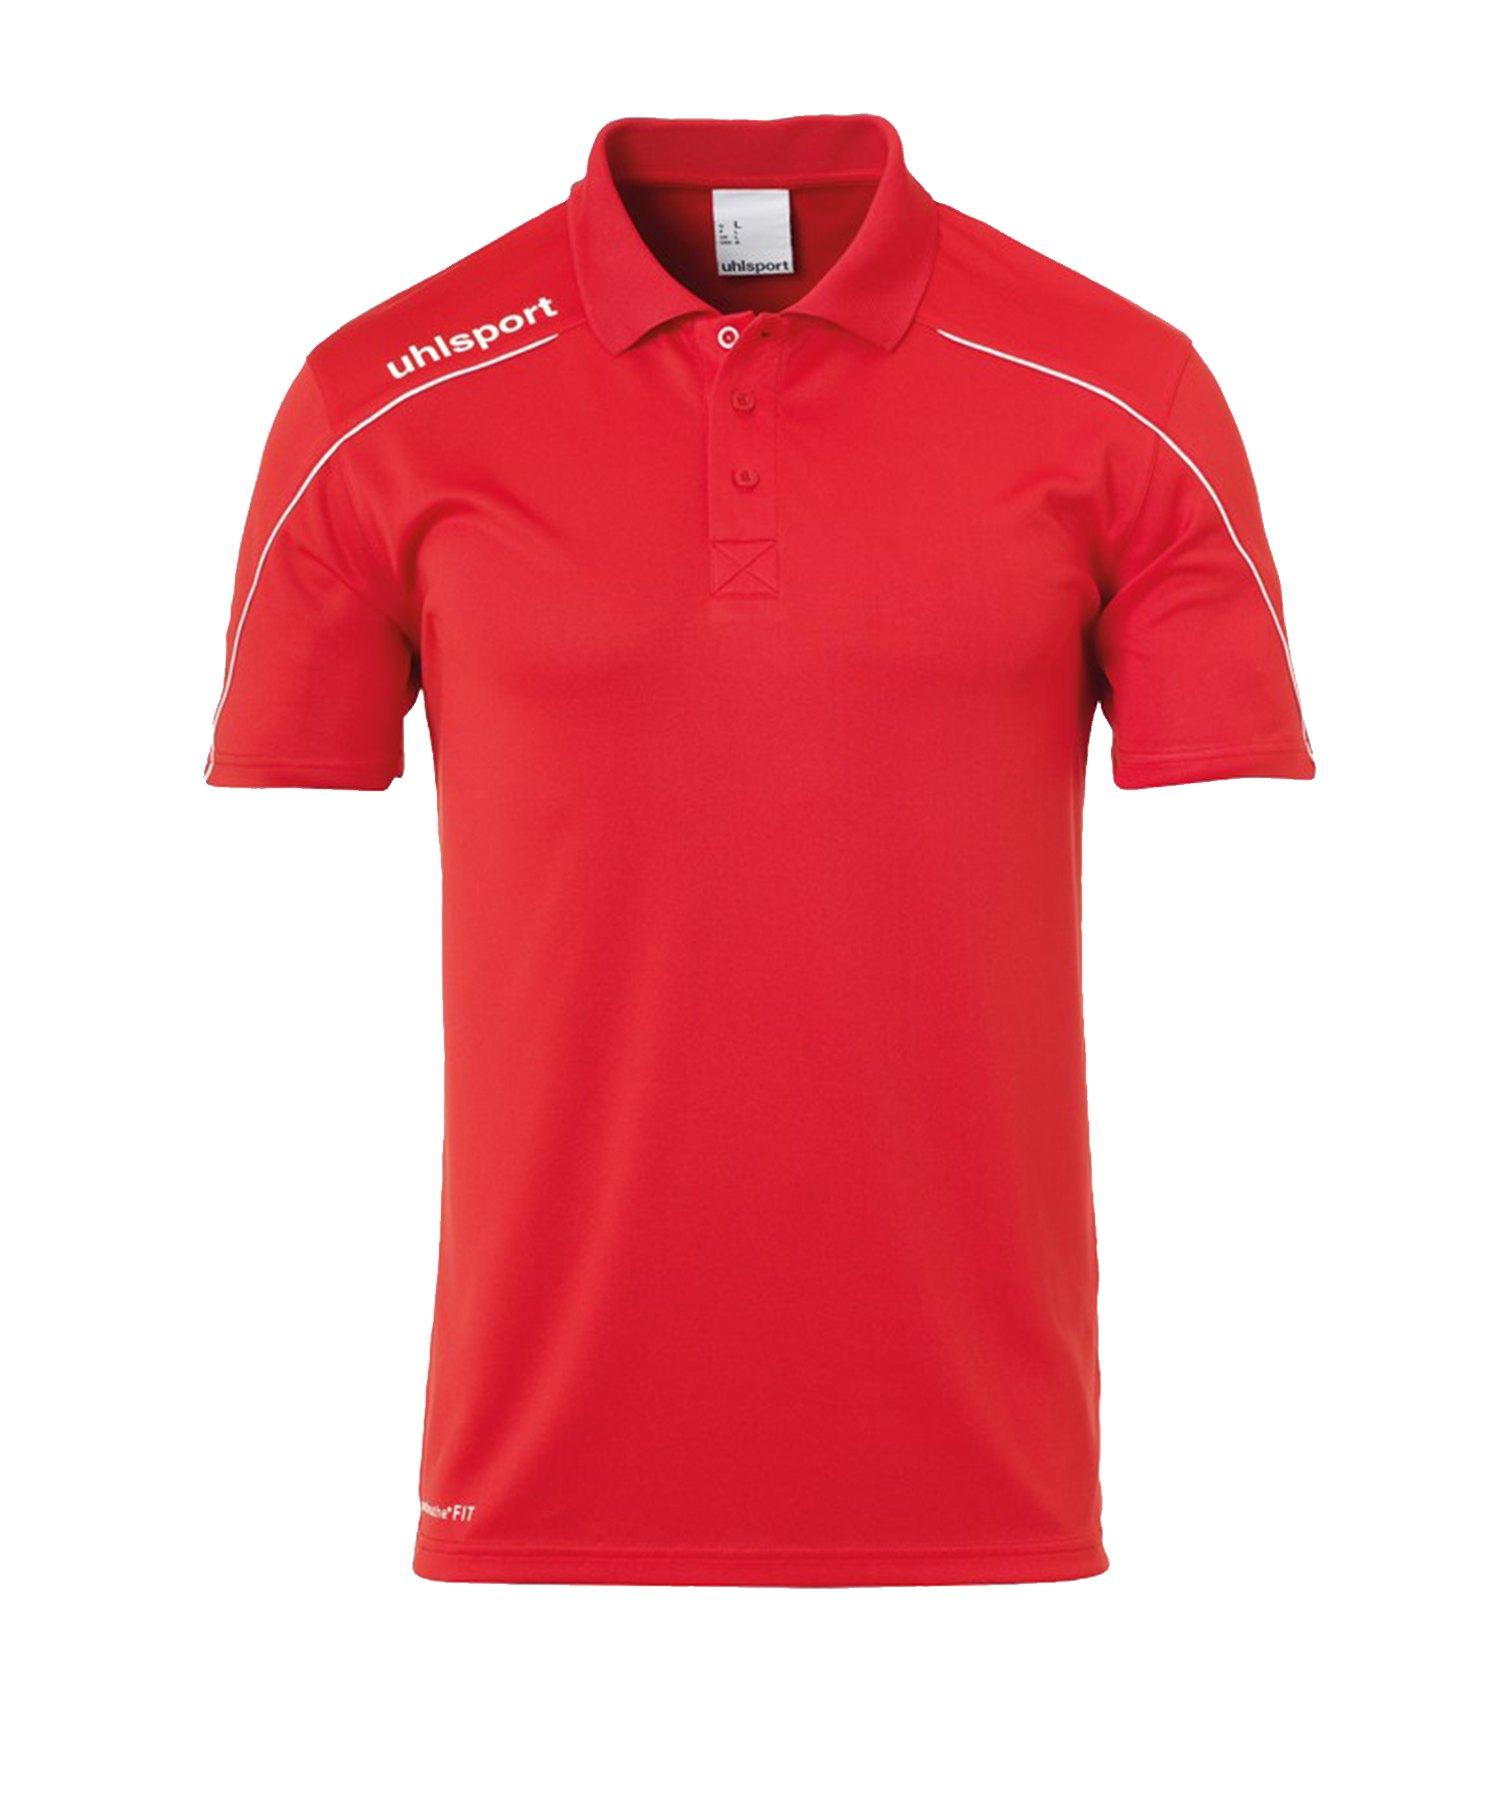 Uhlsport Stream 22 Poloshirt Kids Rot Weiss F04 - Rot